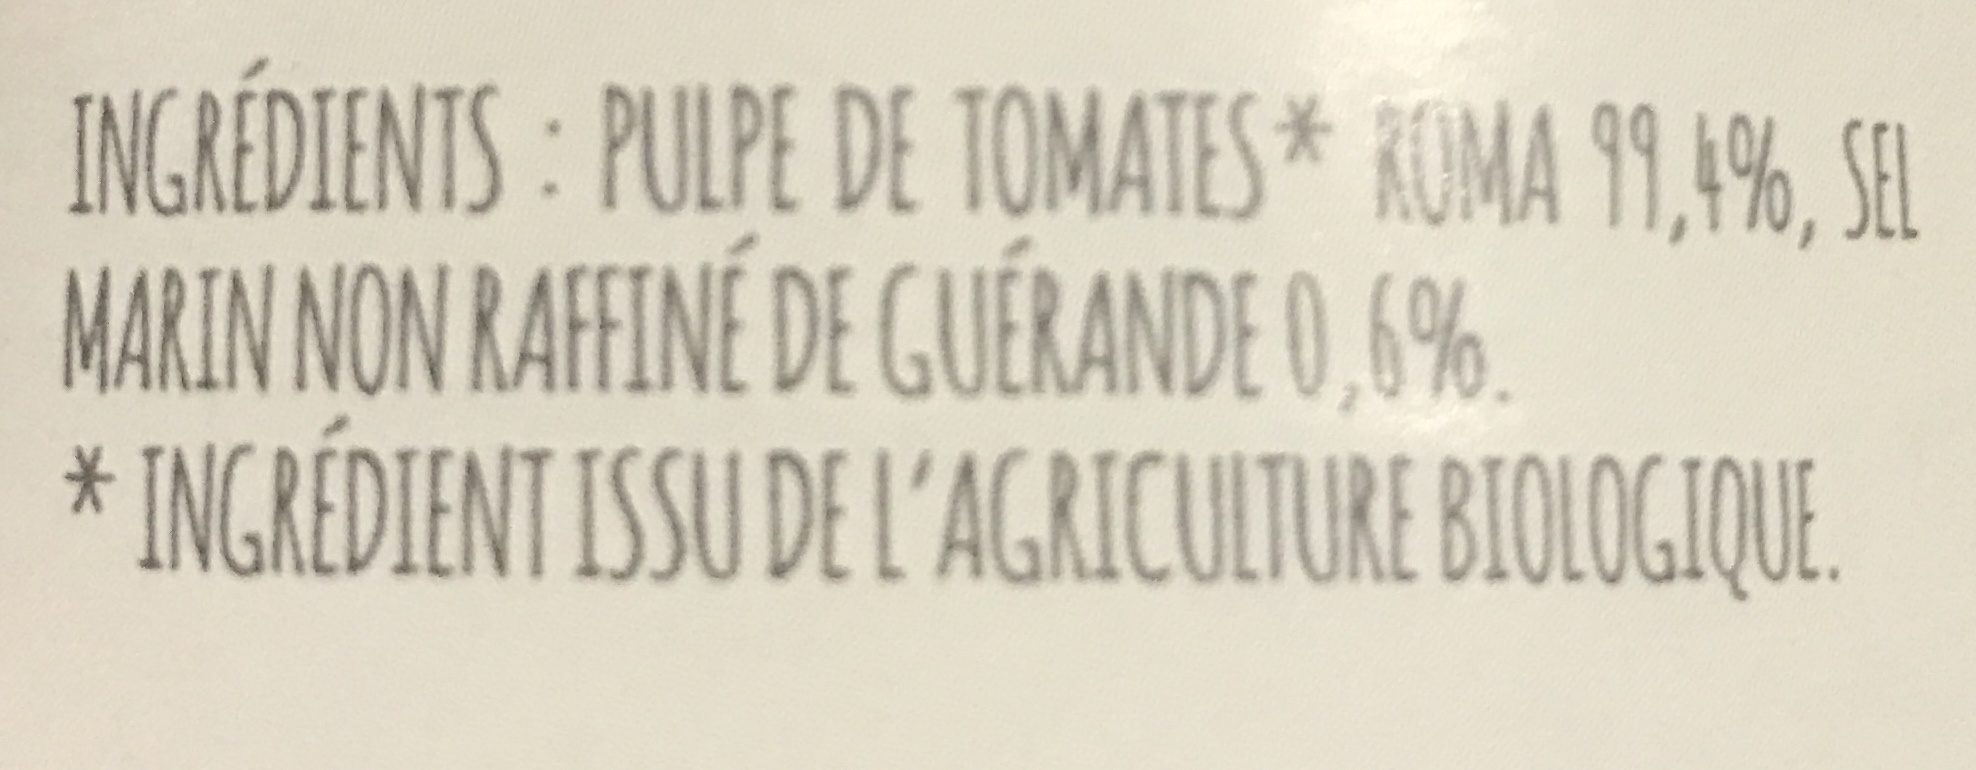 Chair de tomates - Ingredients - fr